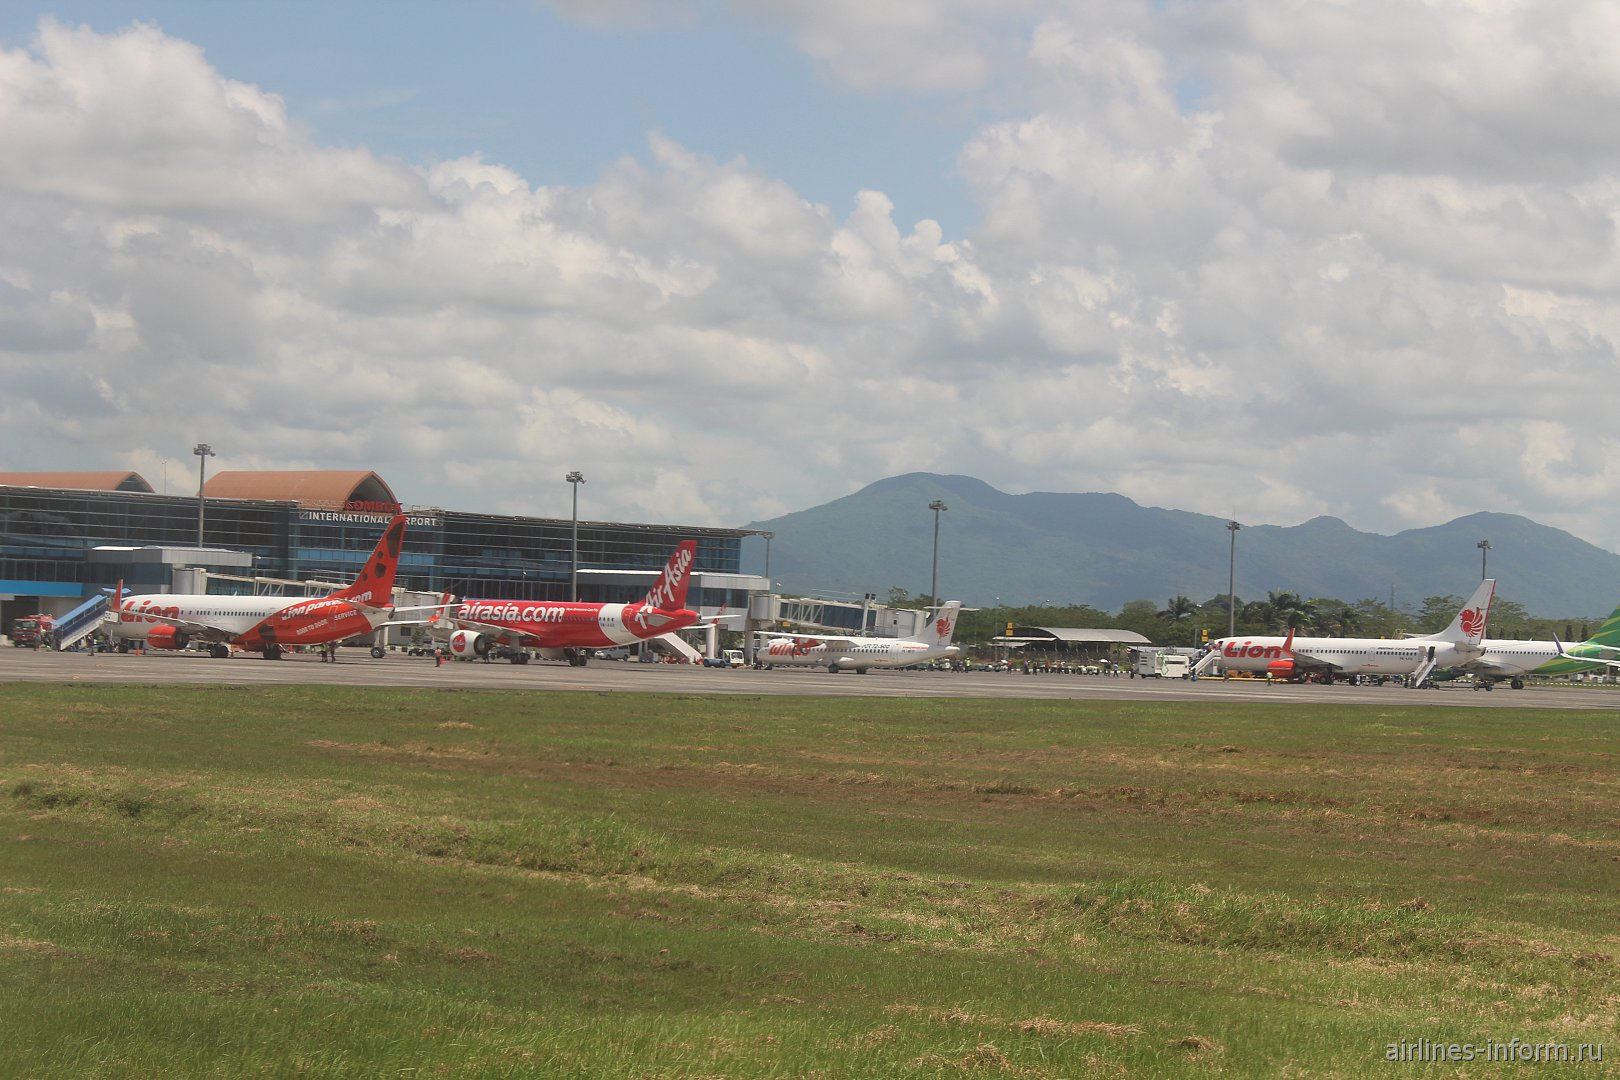 Перрон аэропорта Ломбок